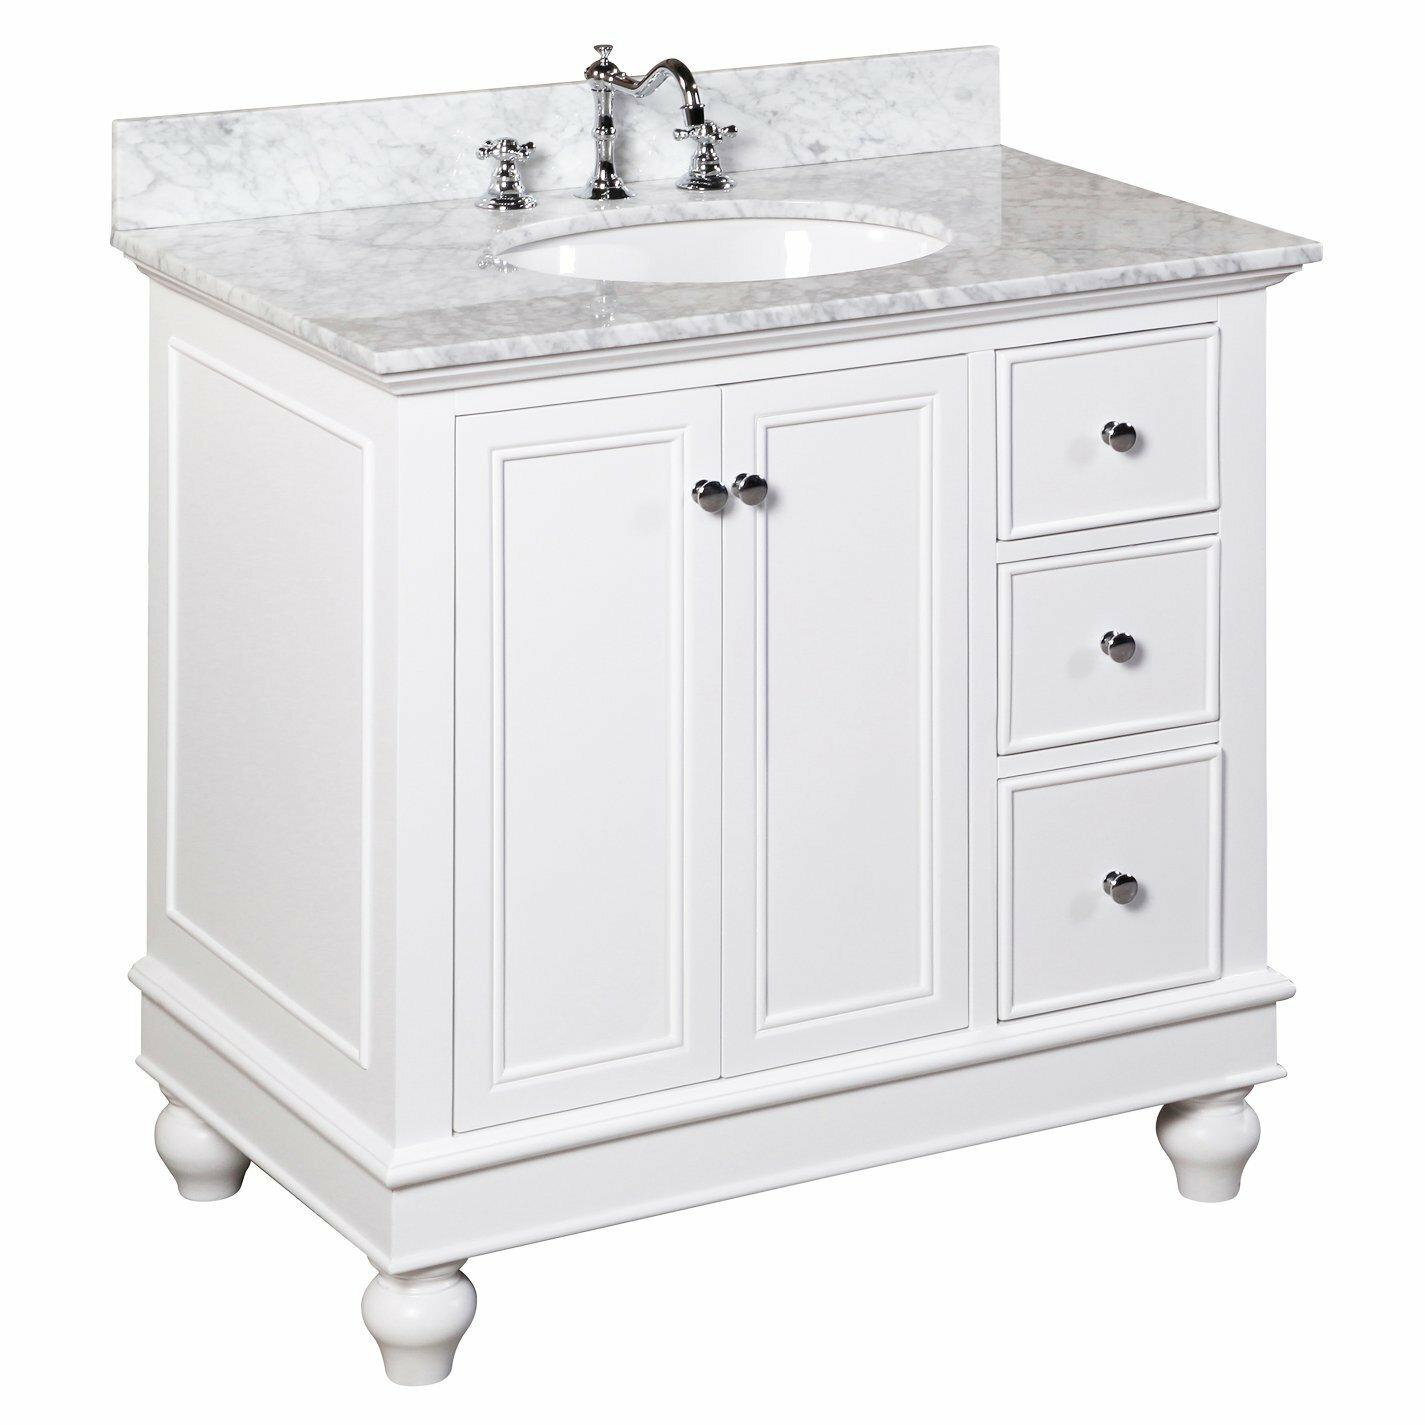 Wayfair bathroom cabinets - Kitchen Bath Collection Bella 36 Single Bathroom Vanity Set